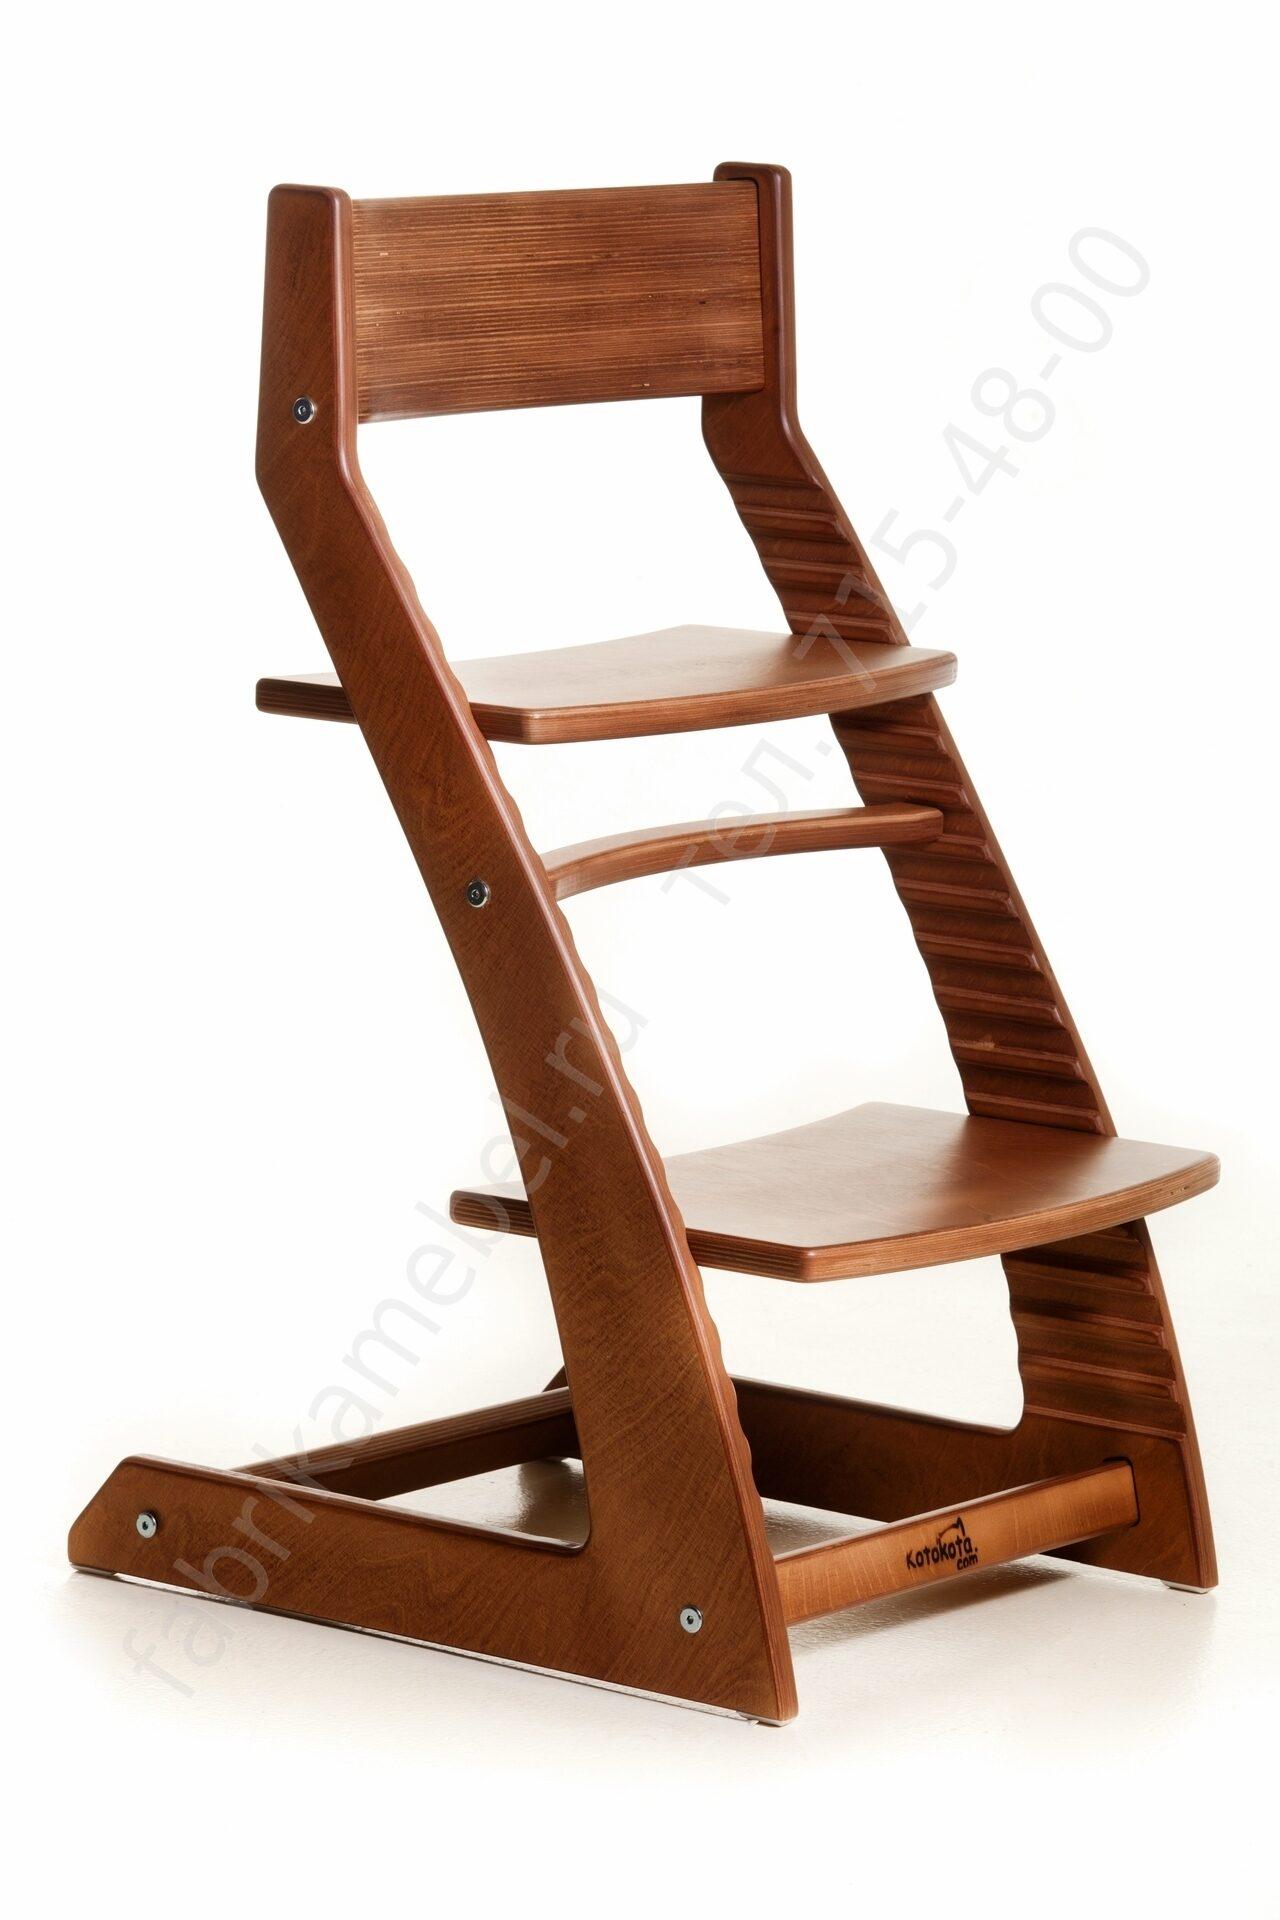 Компьютерное кресло College HLC-0802-1 Beige